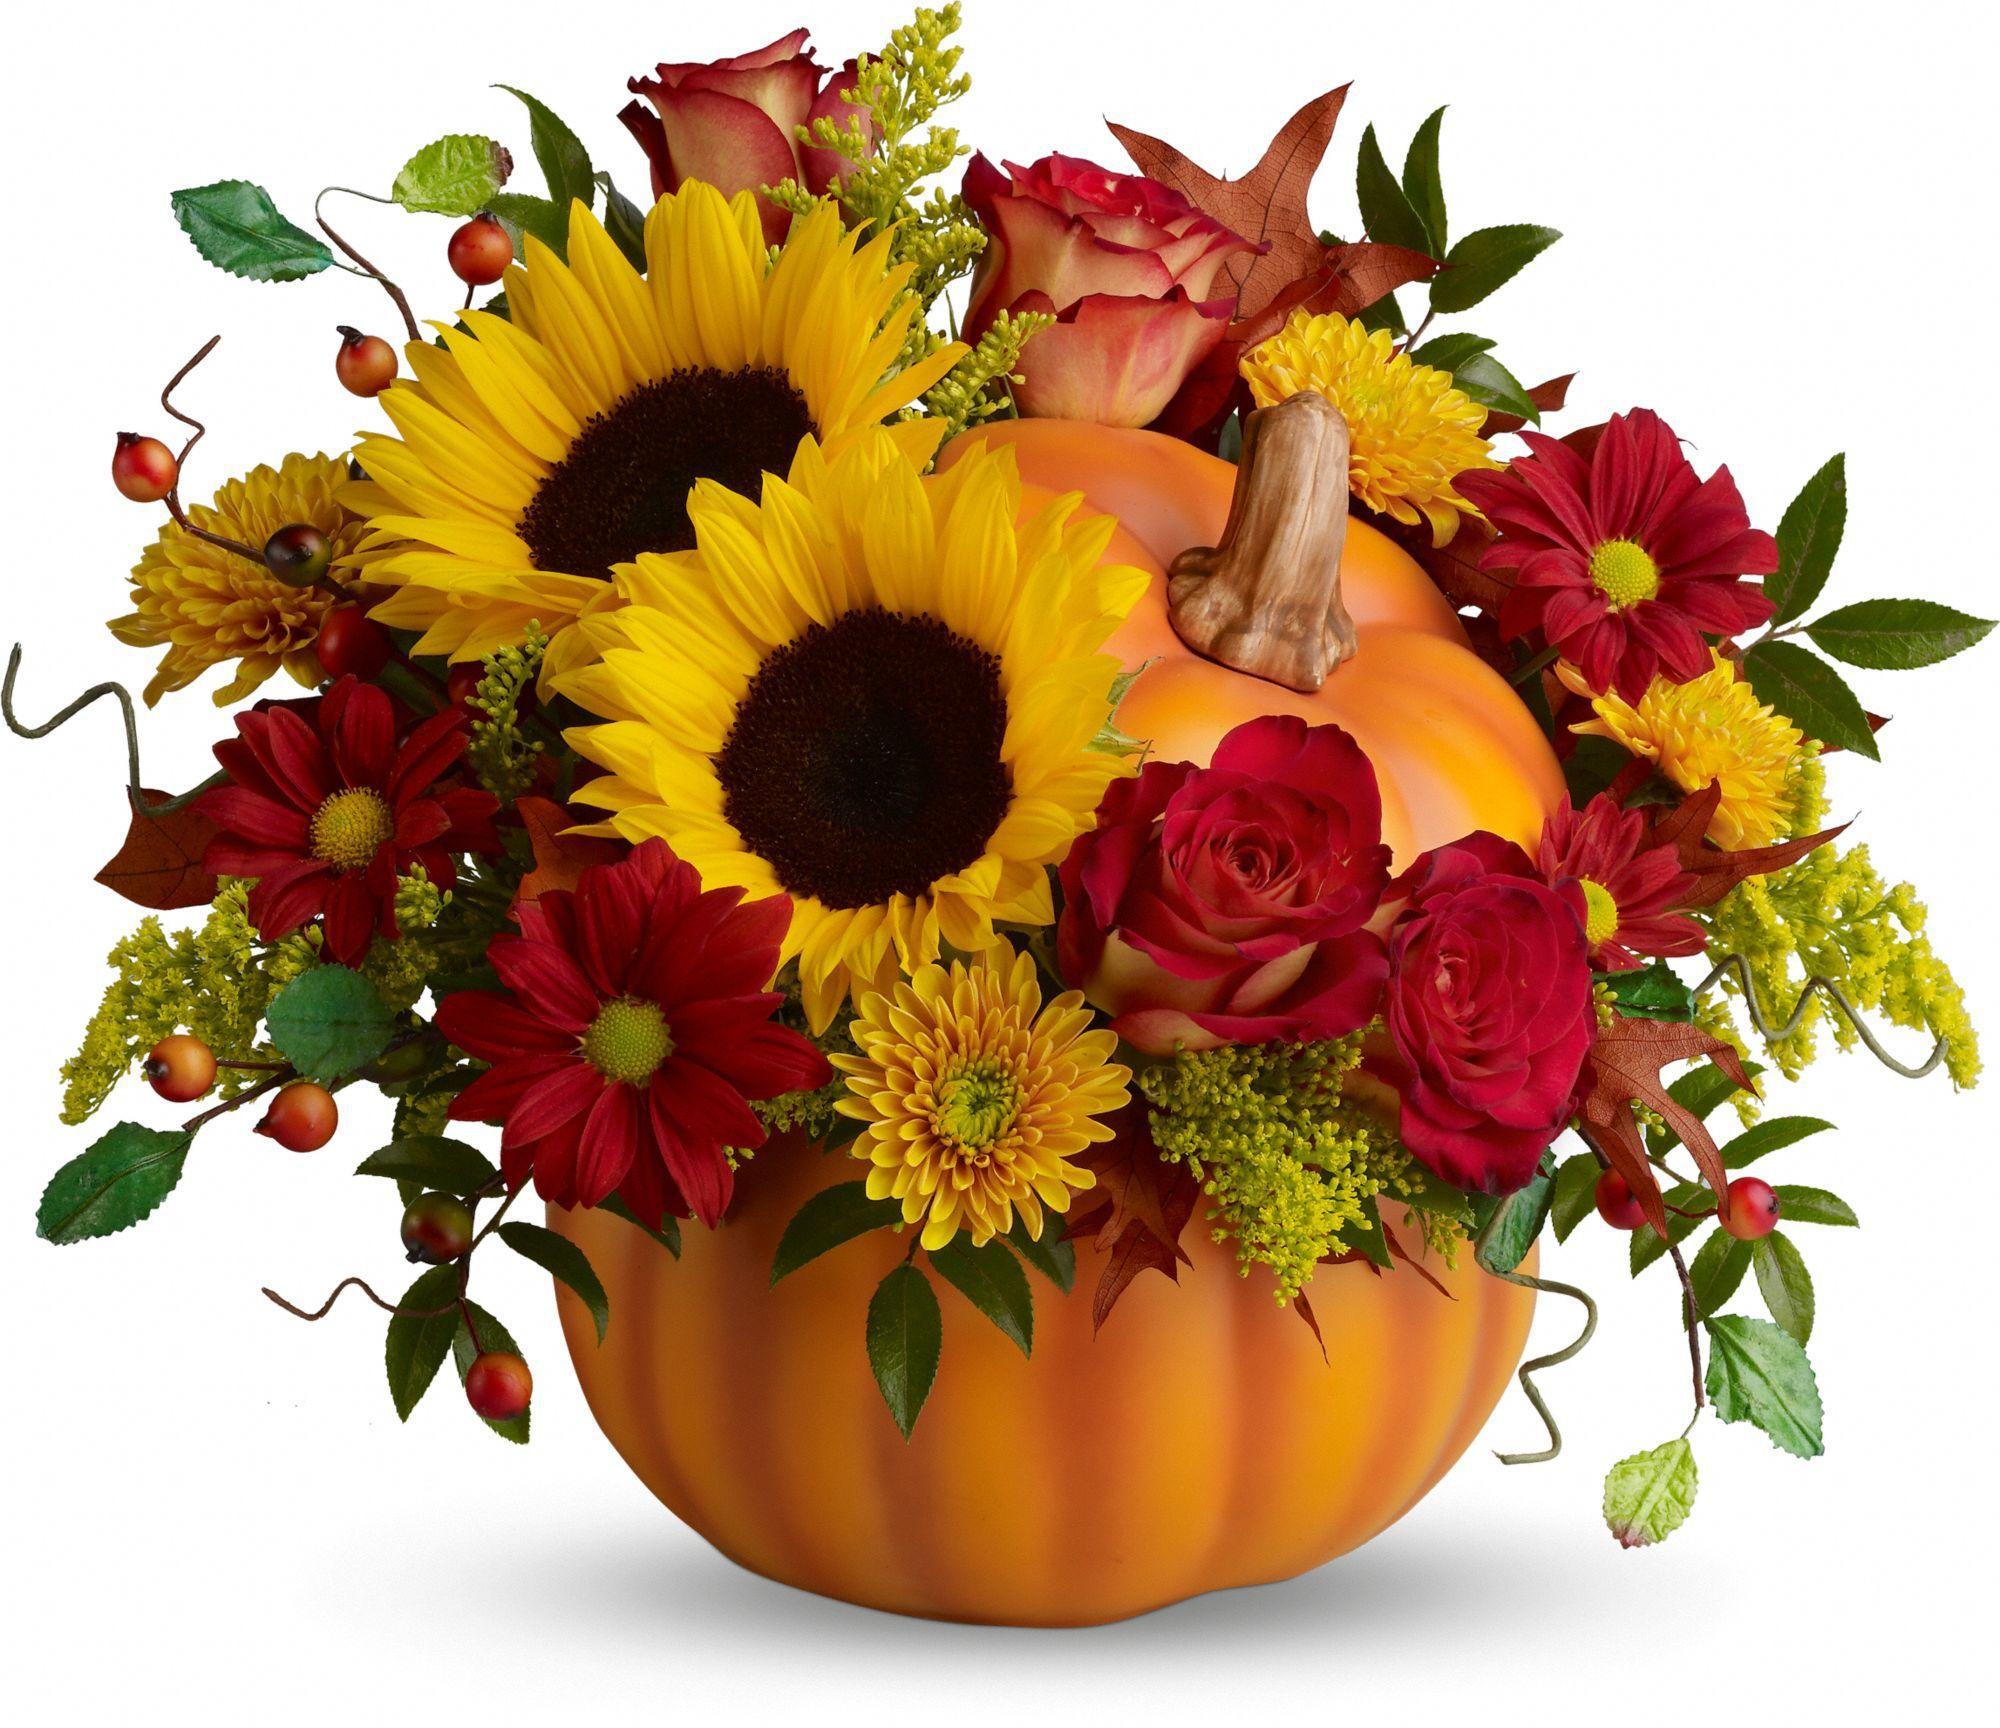 Pin by vero davila on beautiful flowers pinterest pumpkin flowers izmirmasajfo